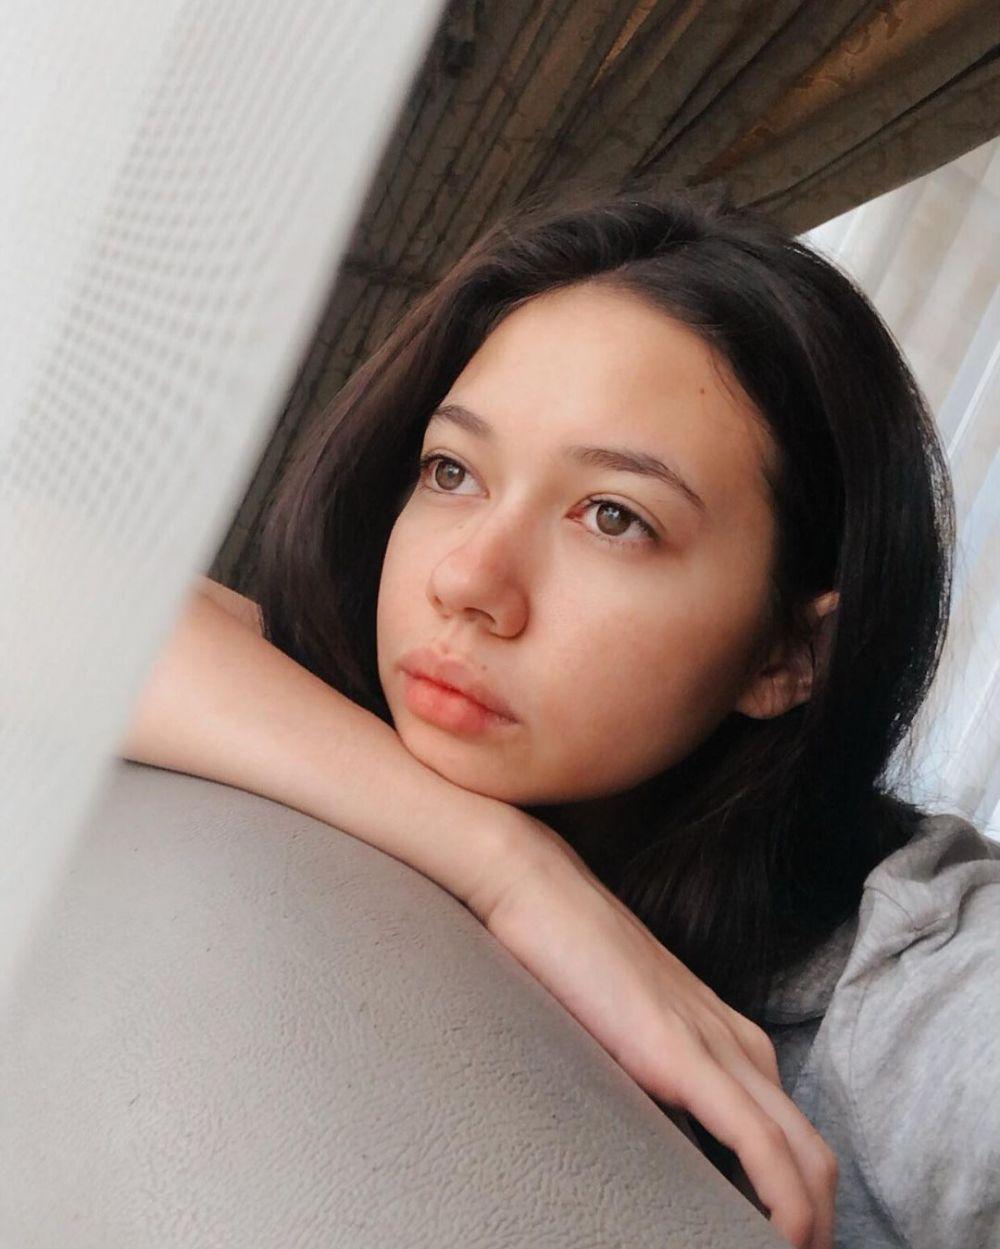 Mantan artis cilik tanpa make up Instagram